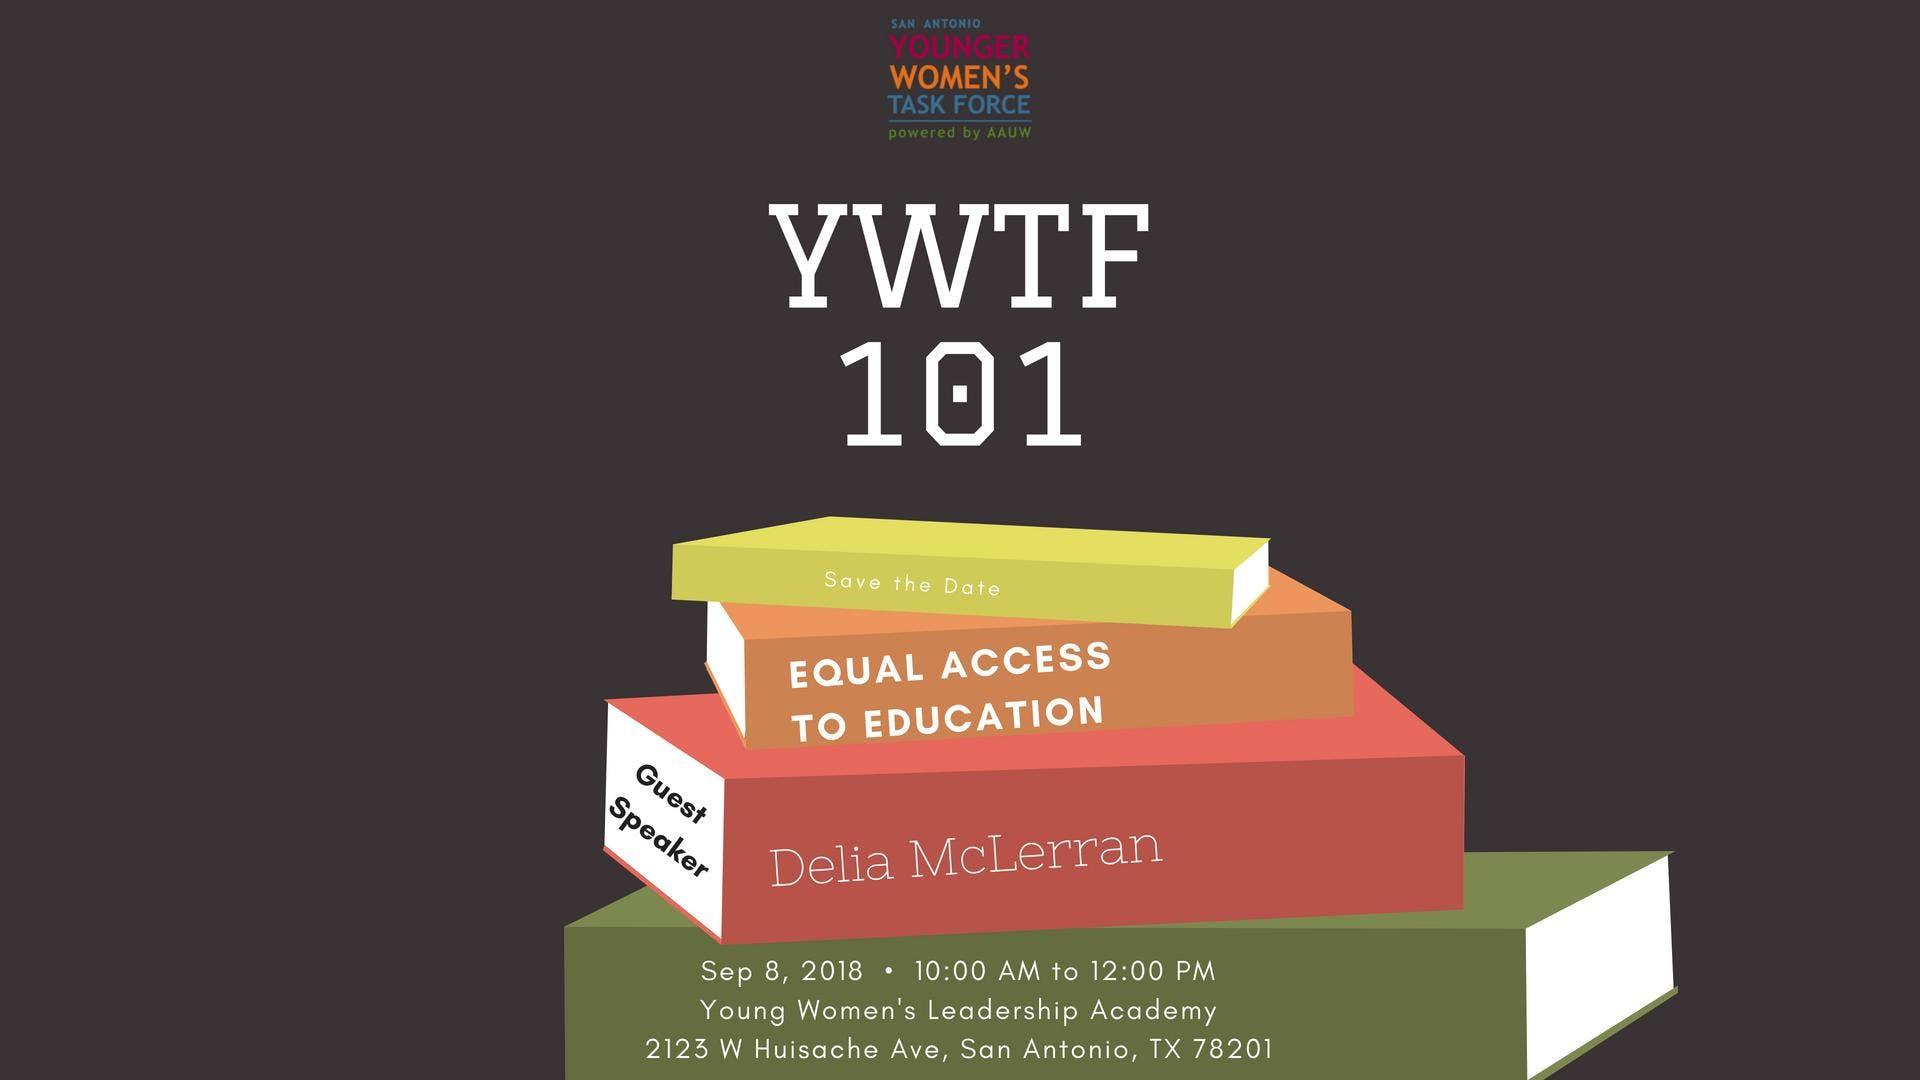 Ywtf 101 8 Sep 2018